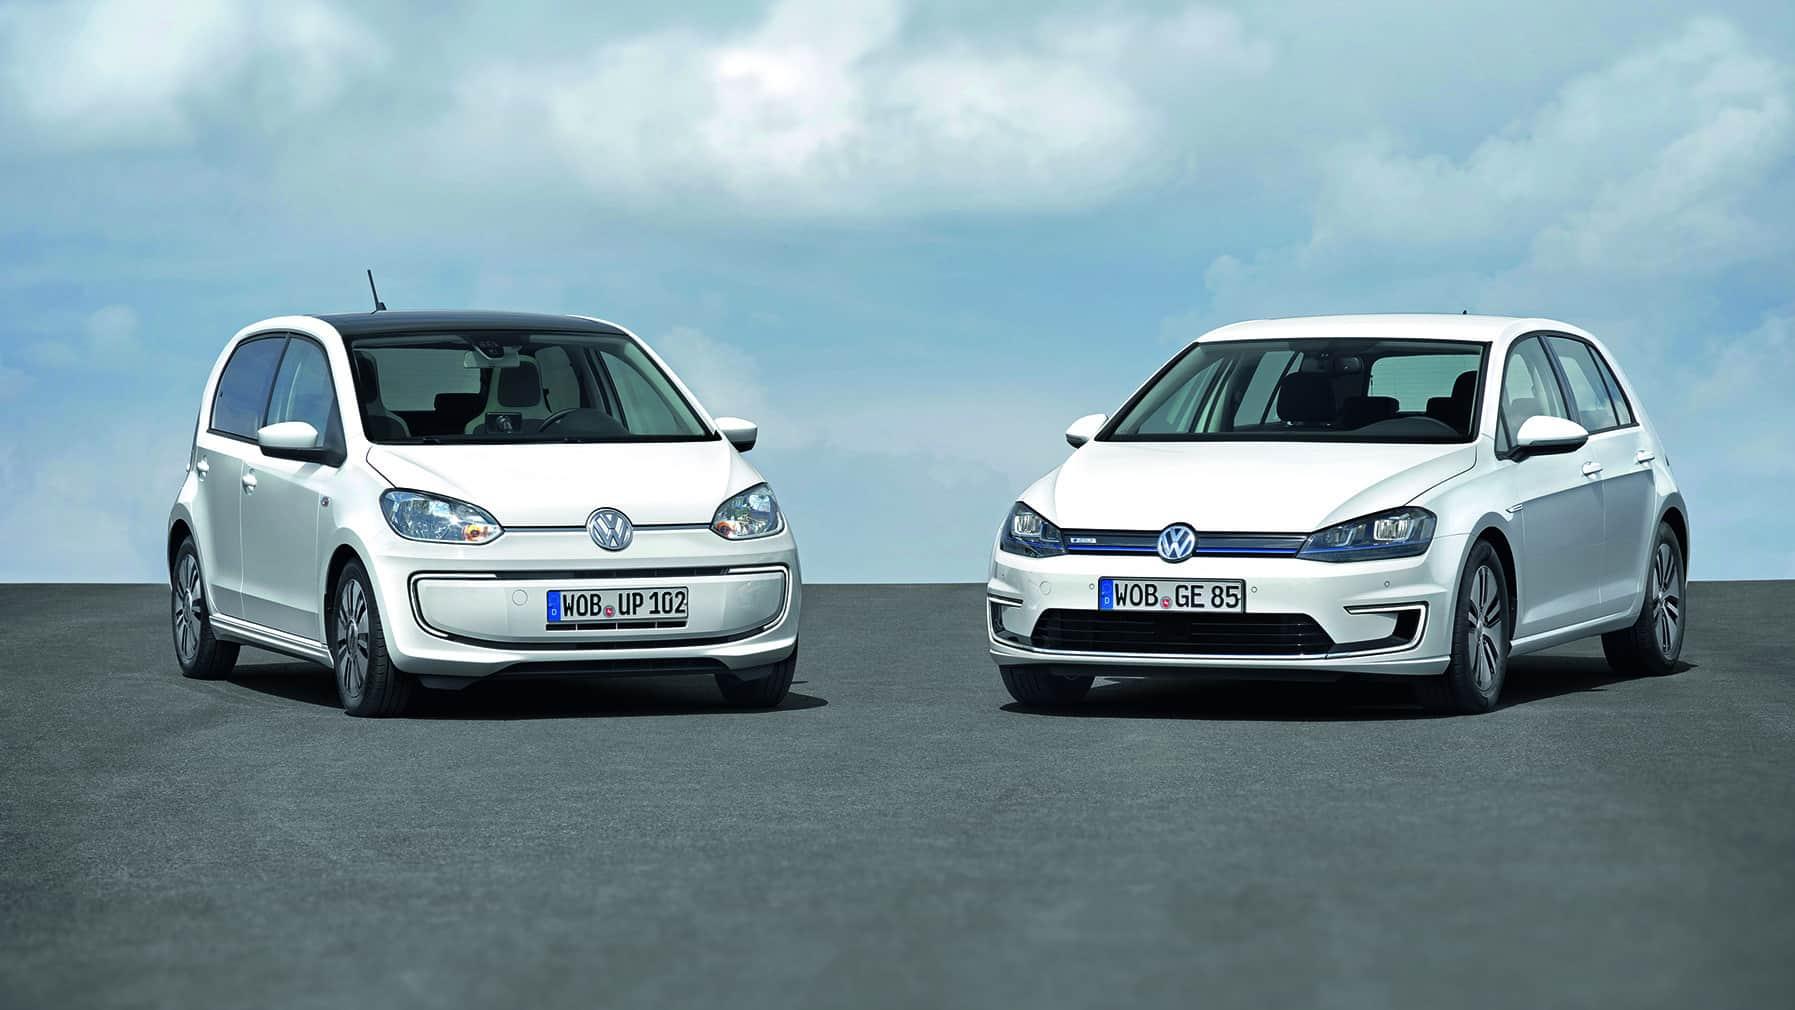 Volkswagen elektrisiert die Großserie